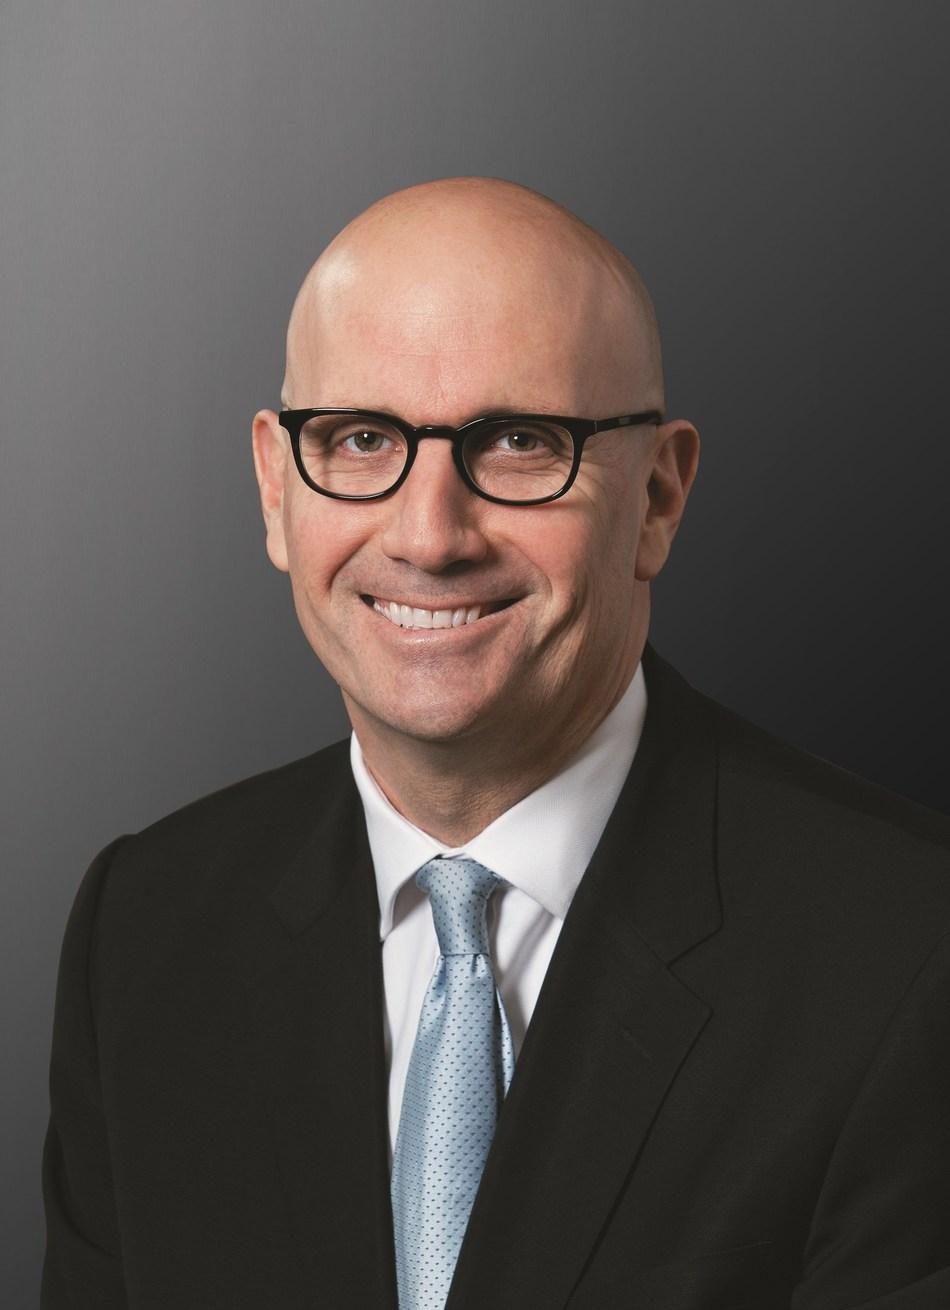 Scott Morey, Executive Director